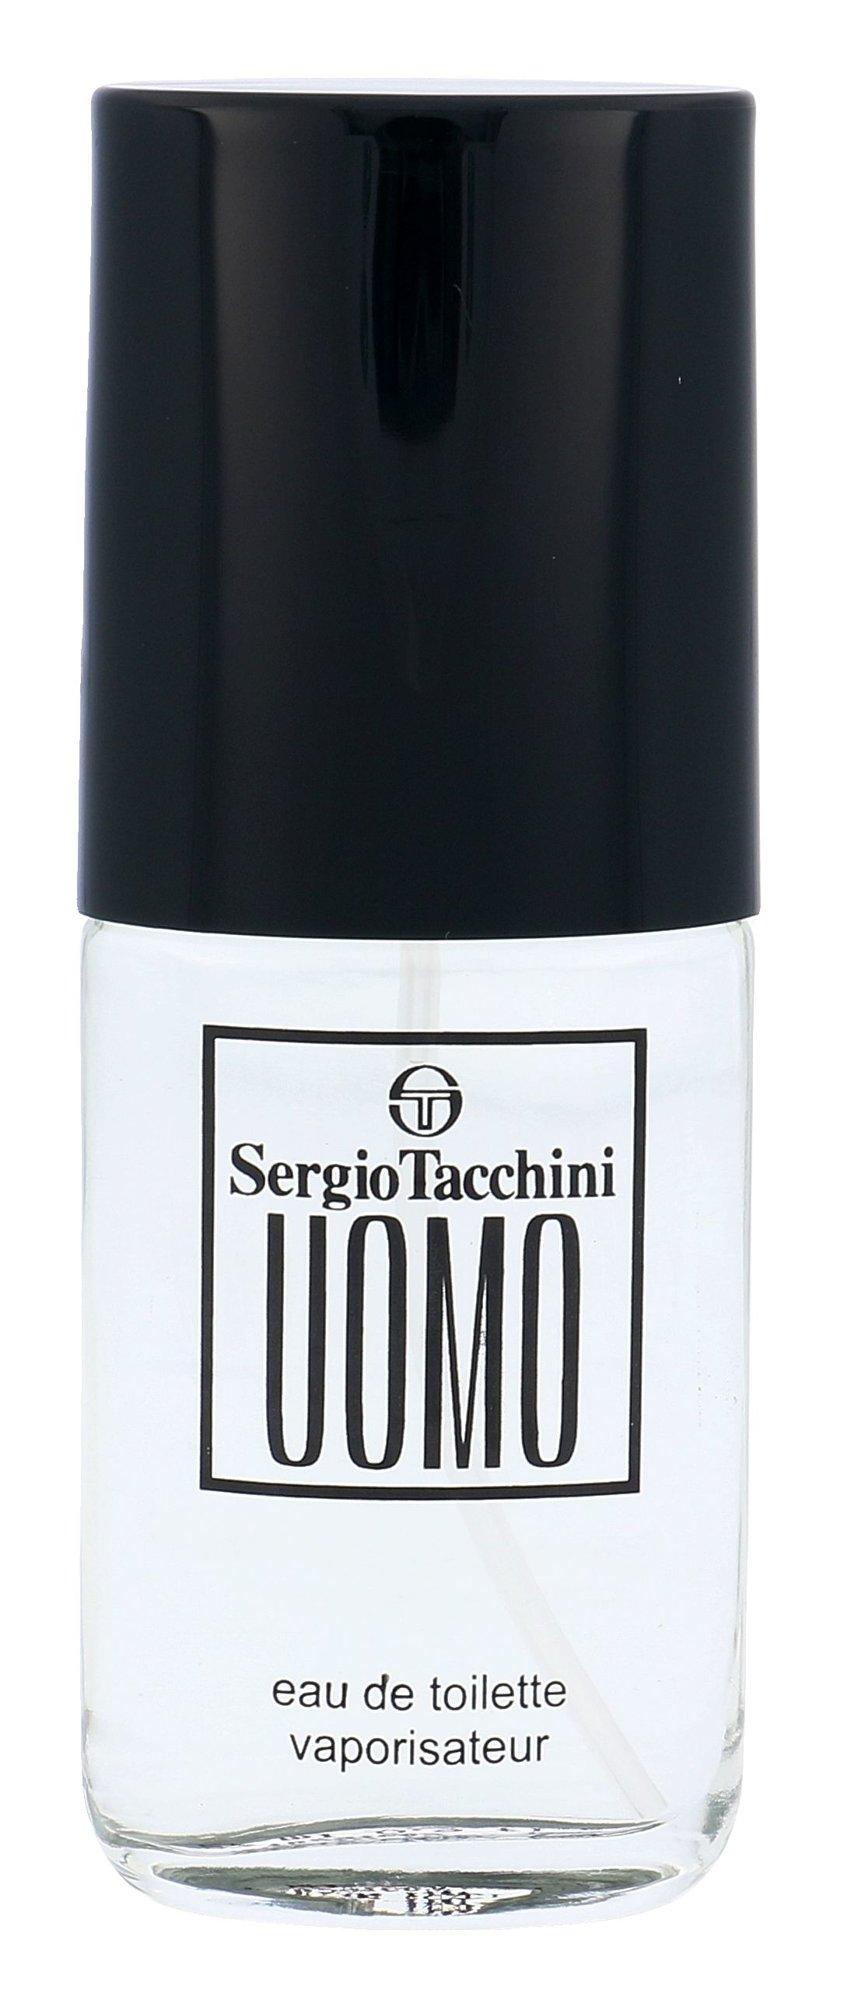 Sergio Tacchini Uomo EDT 27ml